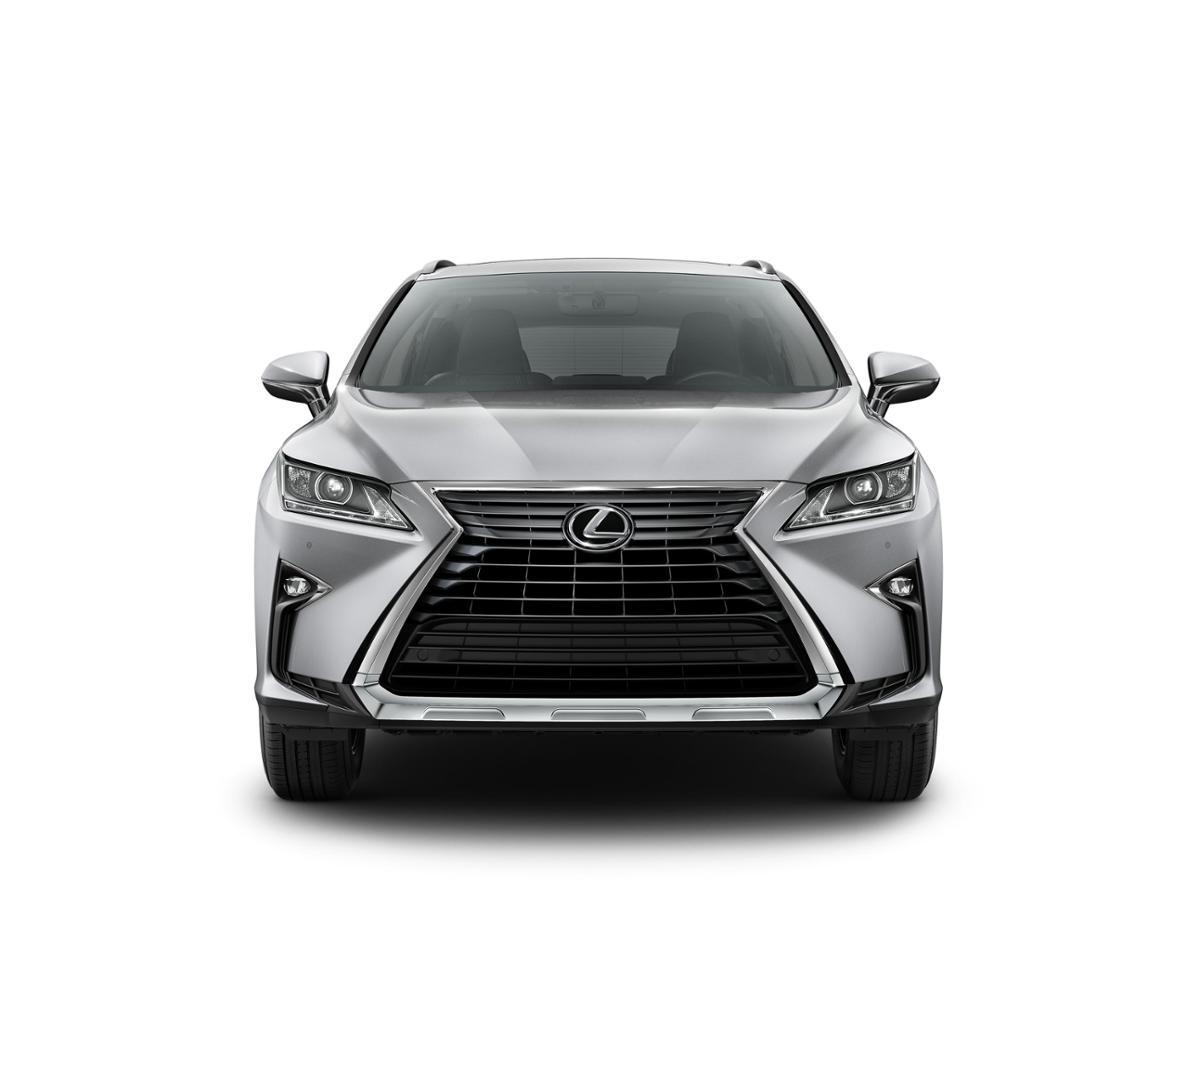 Lexus Suv 2005 For Sale: 2019 Lexus RX 350 Silver Lining Metallic : New